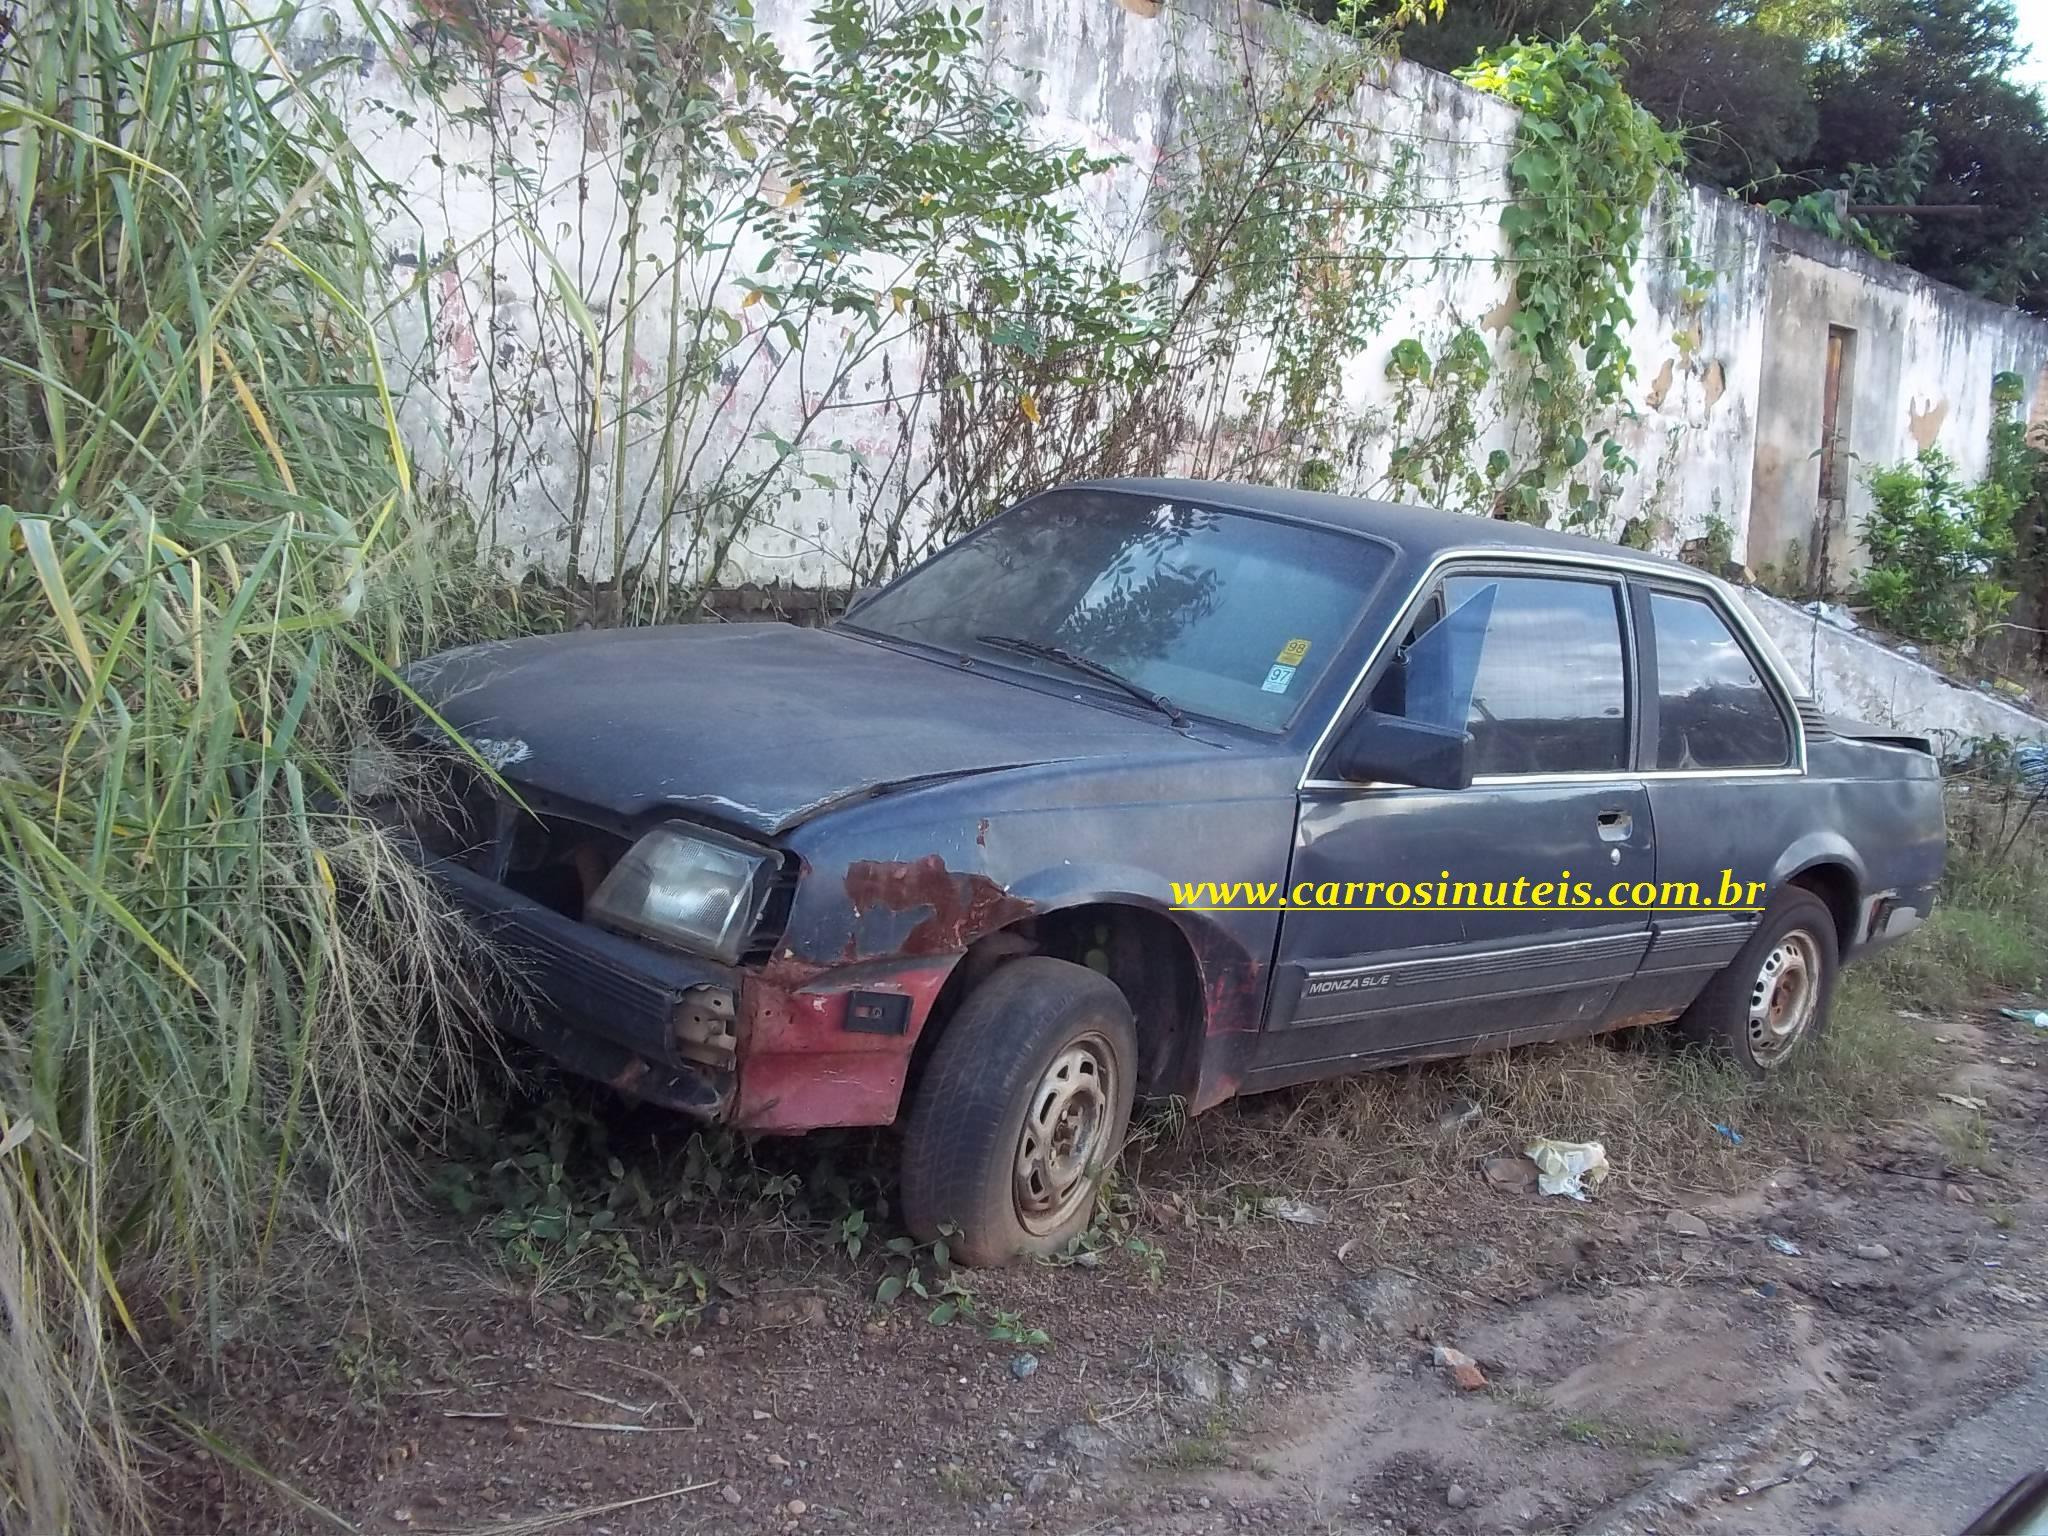 Hugo-Corumbá-de-Goiás-GO-Monza Chevrolet Monza